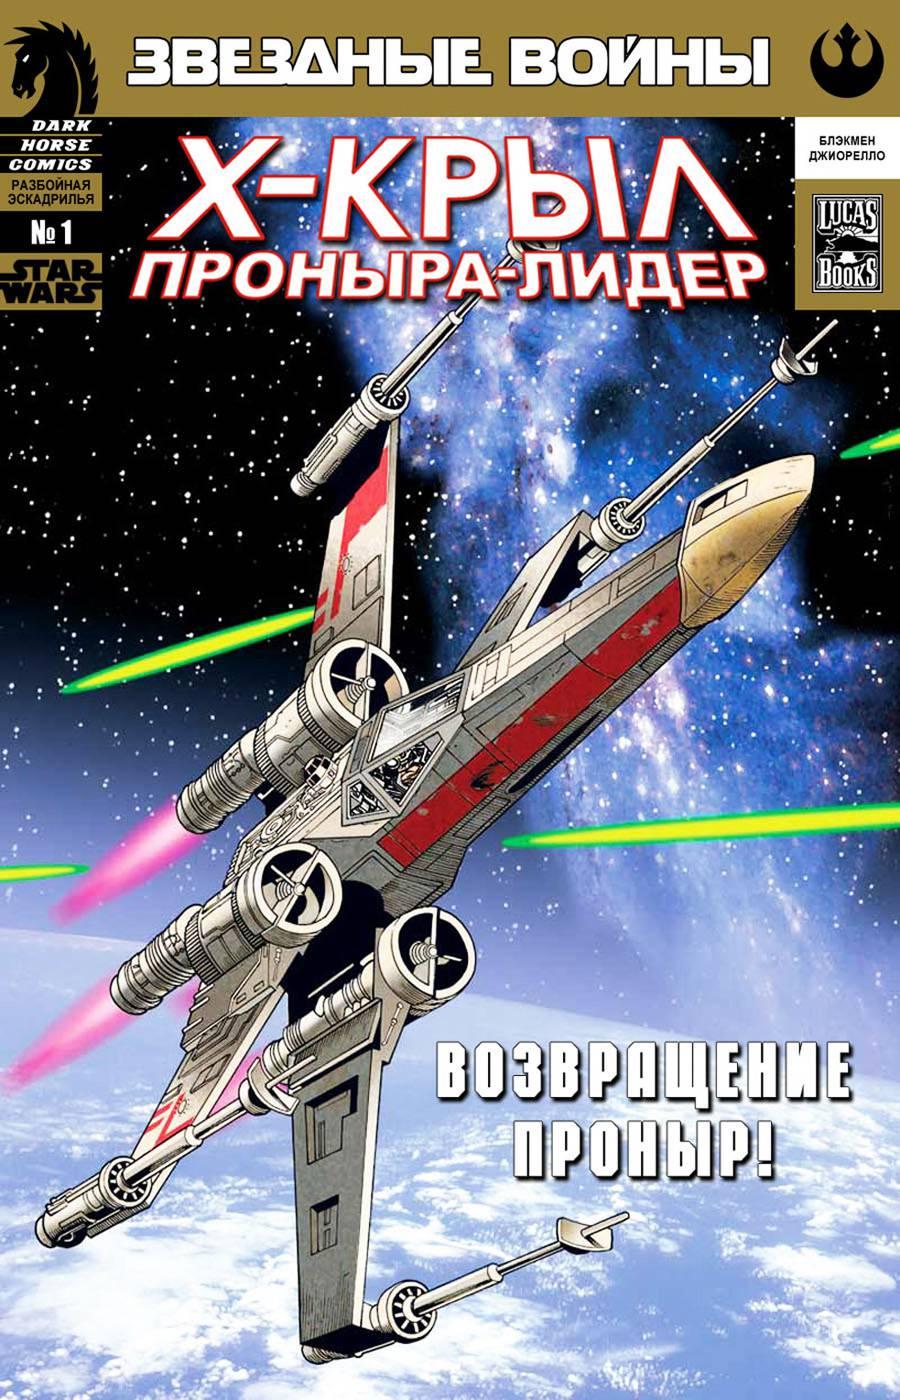 Звездные Войны: Х-Крыл: Проныра-Лидер №1 онлайн